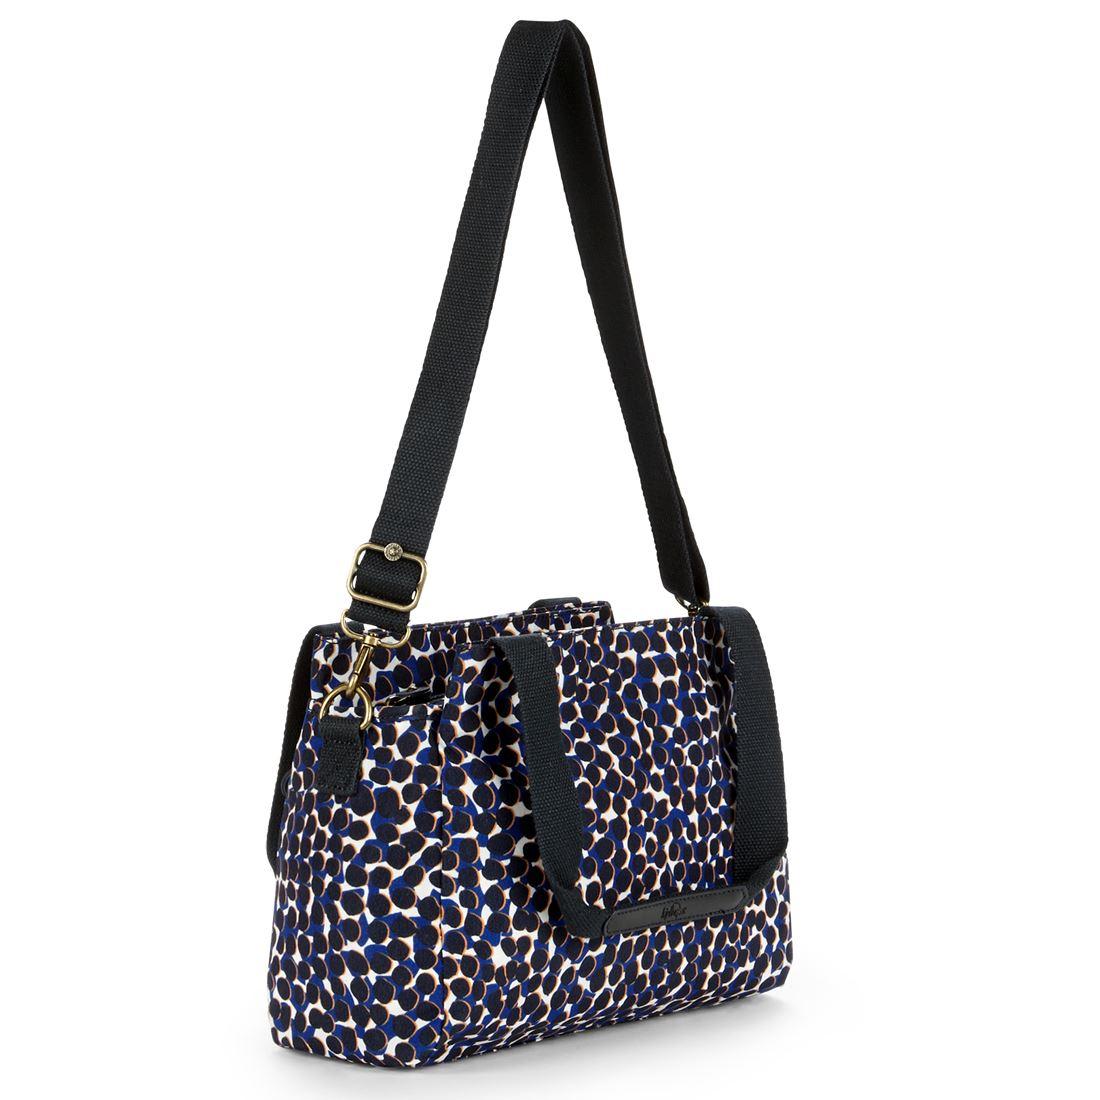 Kipling-Elysia-Womens-Ladies-Cross-Body-Shoulder-Bag-